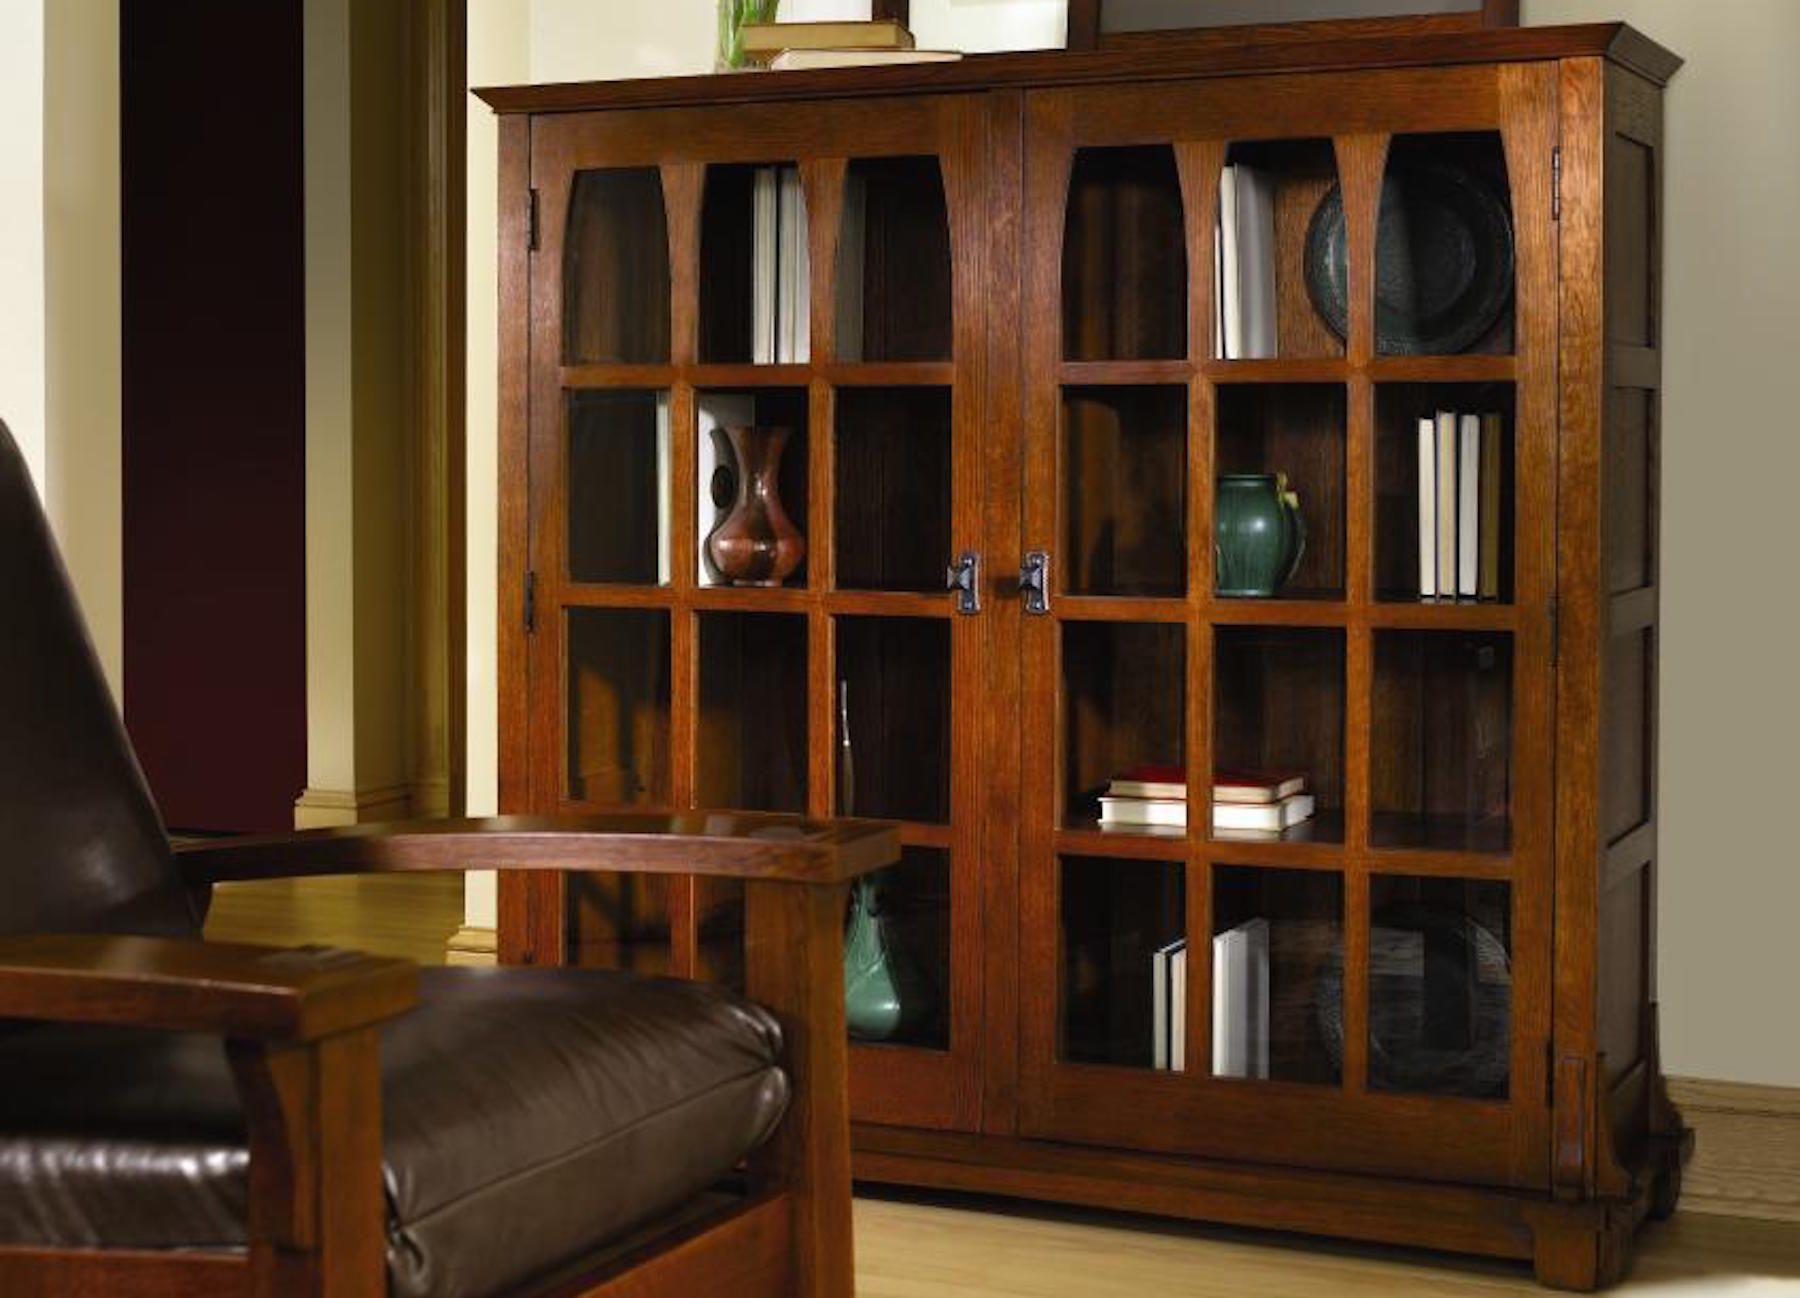 Ballwin In 2020 Craftsman Furniture Craftsman Style Furniture